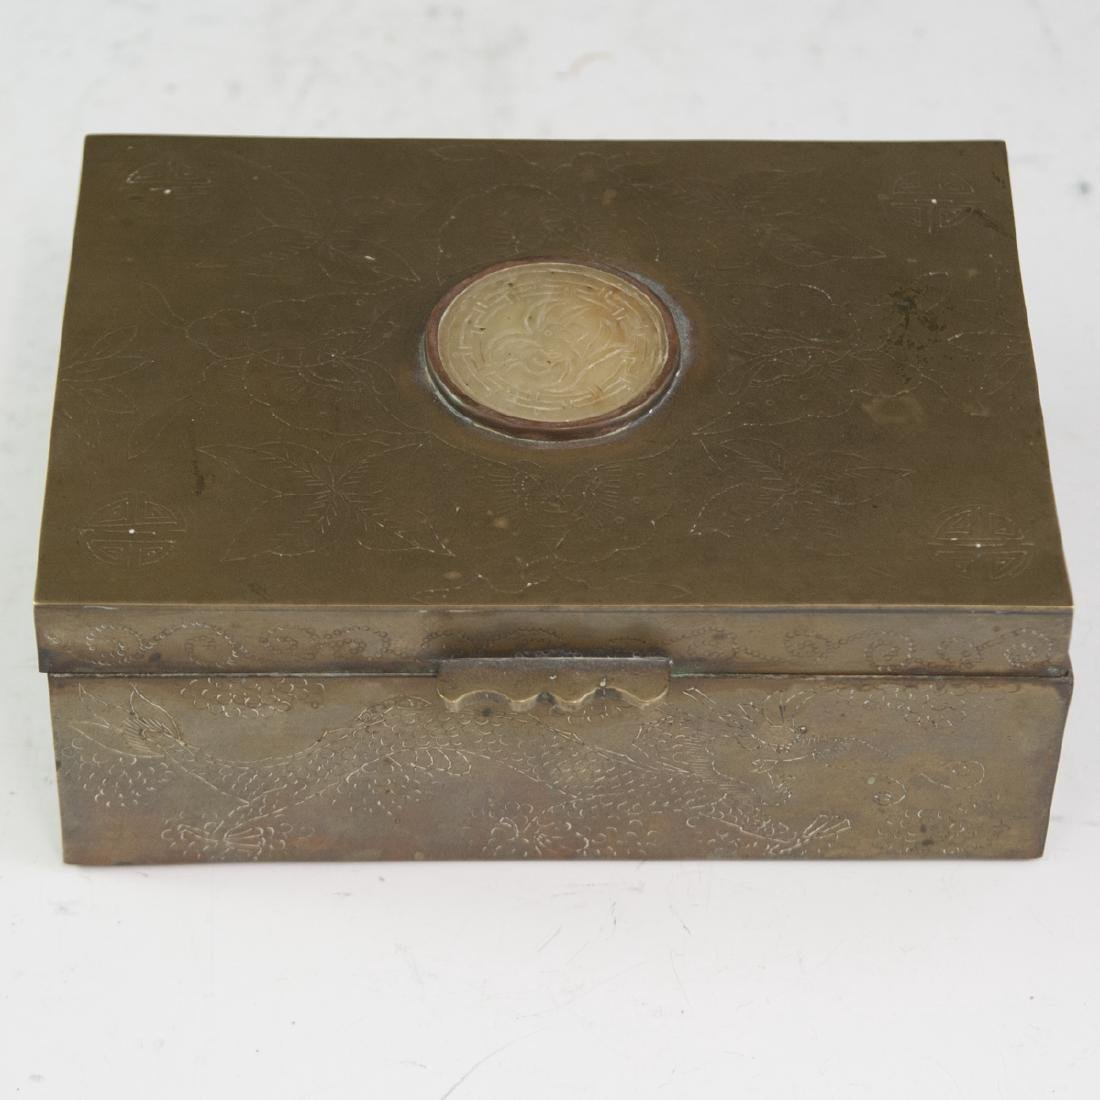 Chinese Engraved Brass & Jade Box